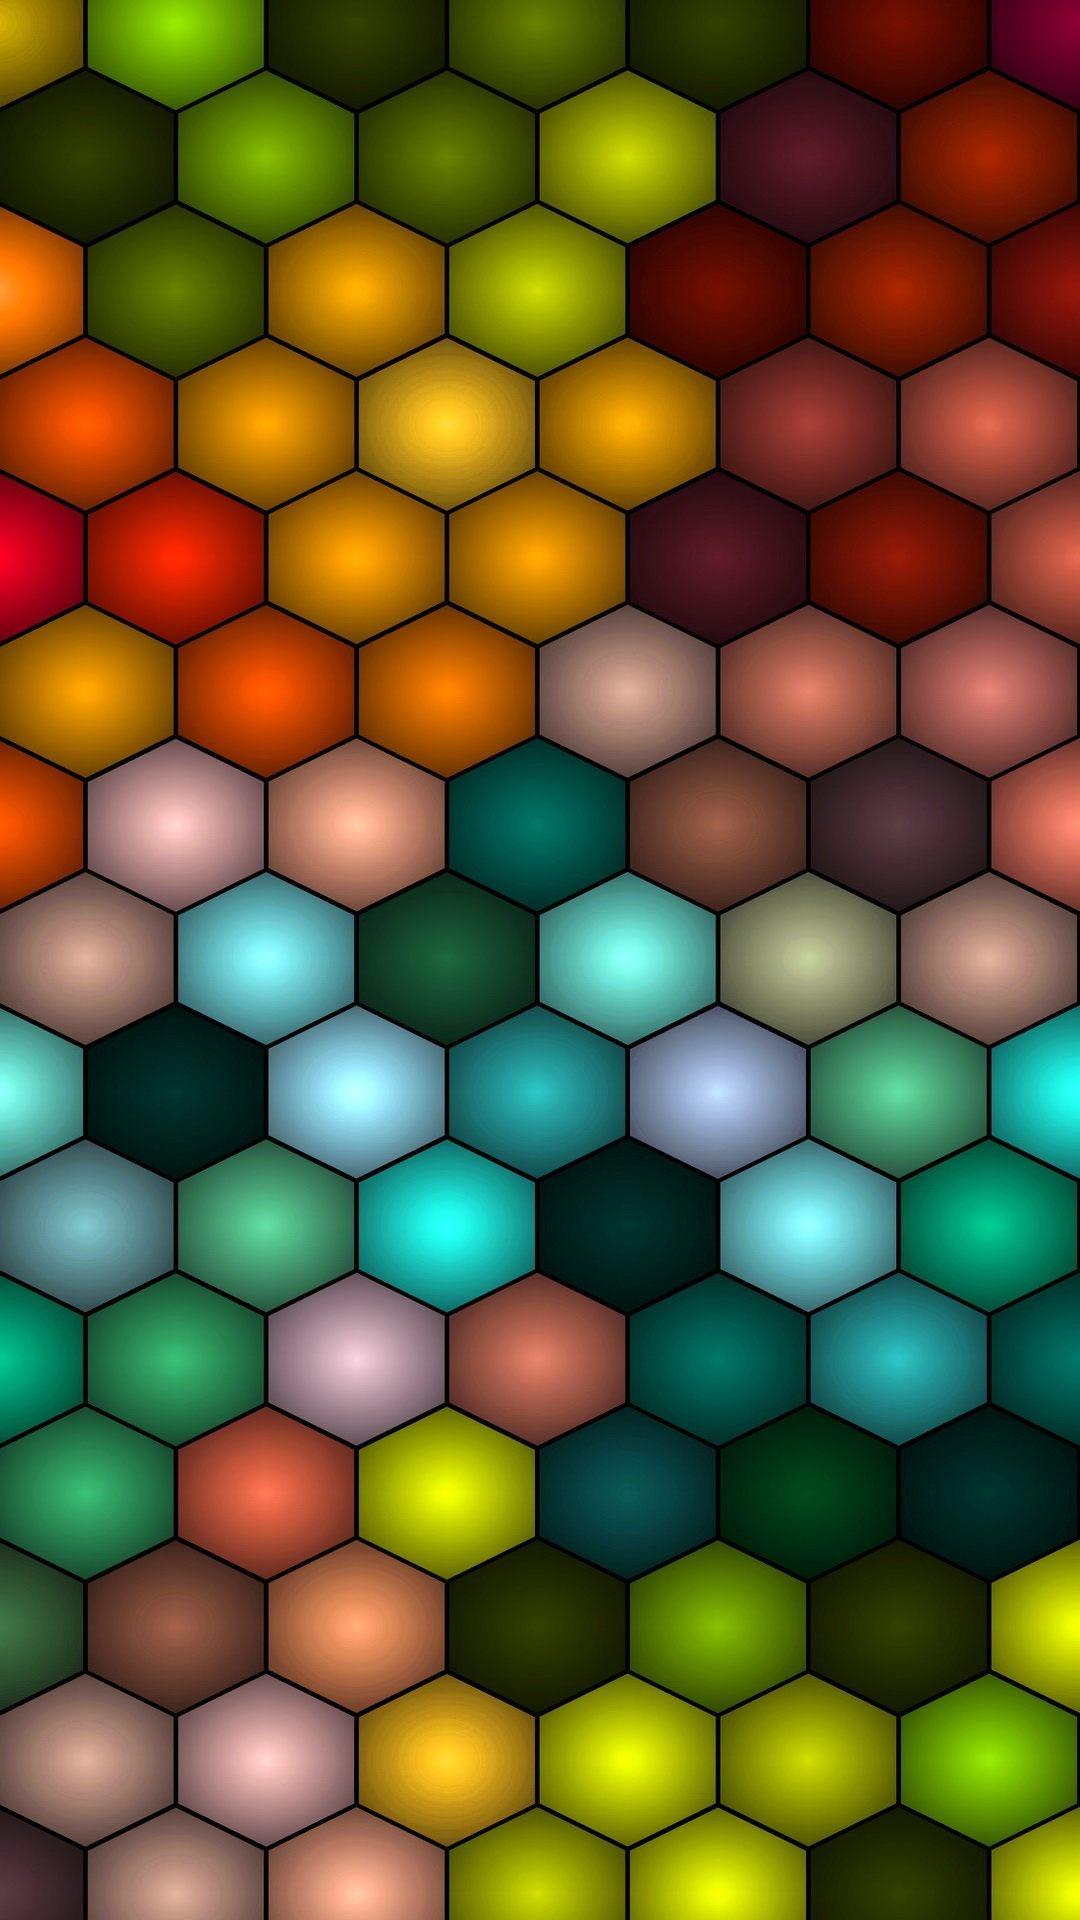 Hipster Quotes Wallpaper Iphone Abstract Iphone Wallpaper Pixelstalk Net